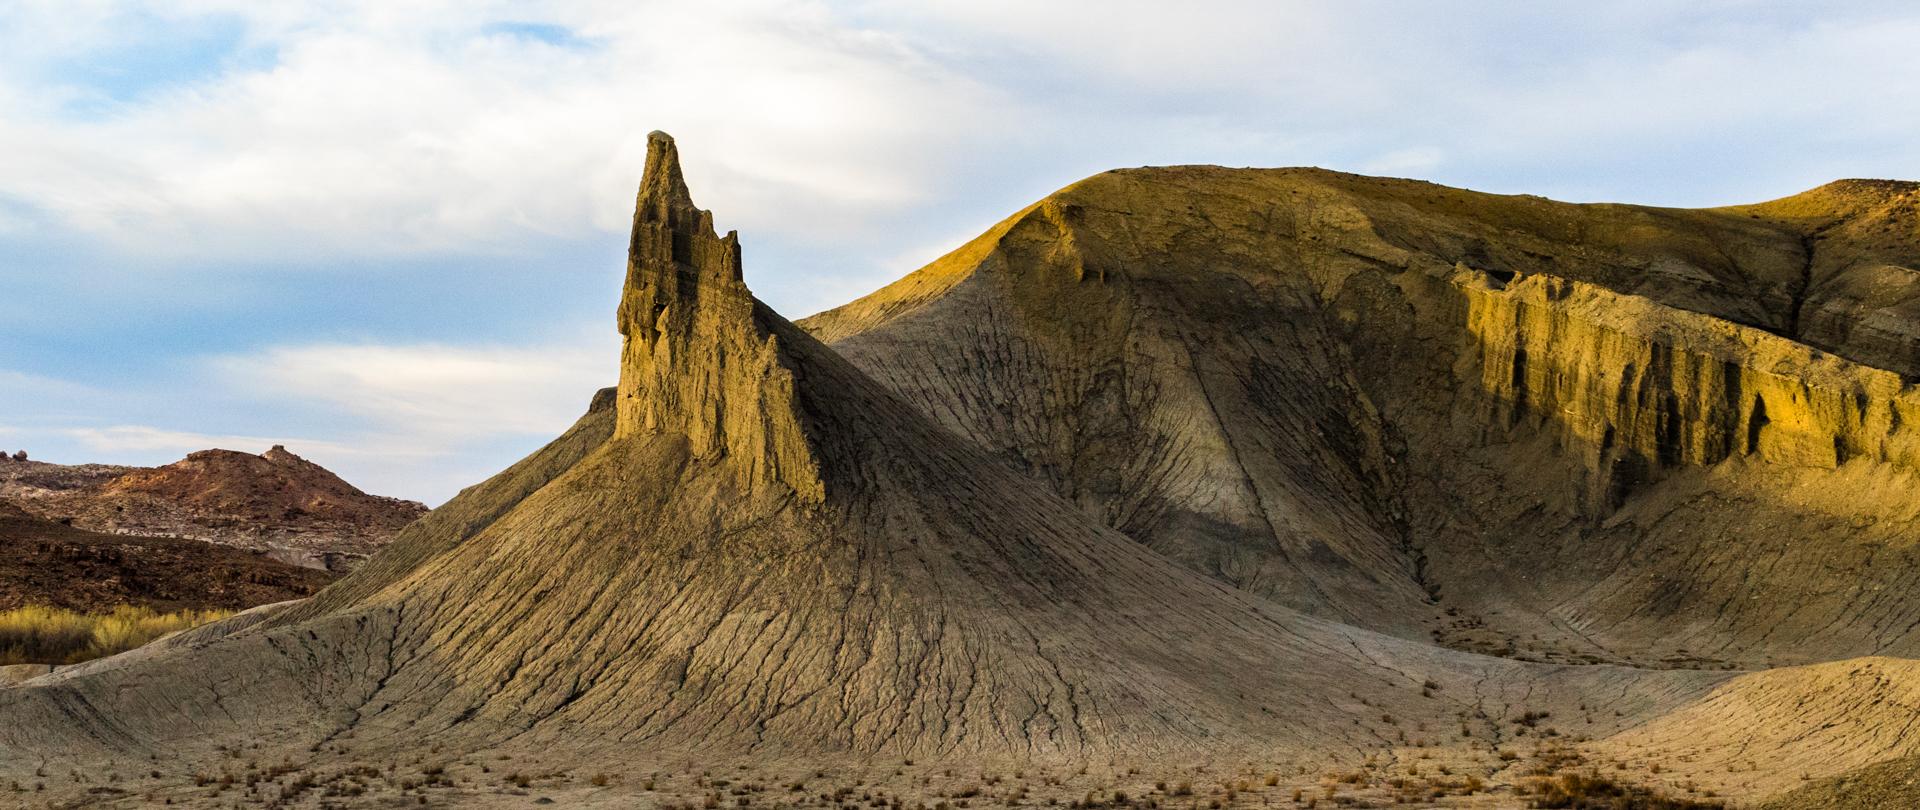 Utah Sandstone Cliffs